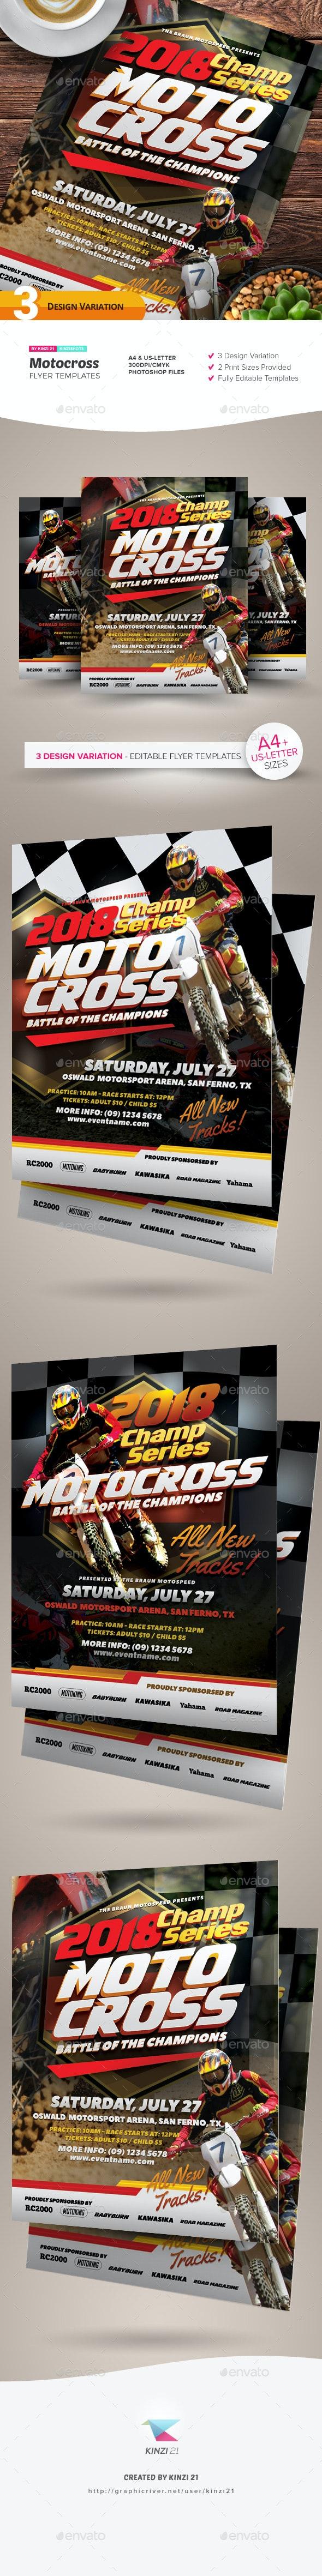 Motocross Flyer Templates - Sports Events